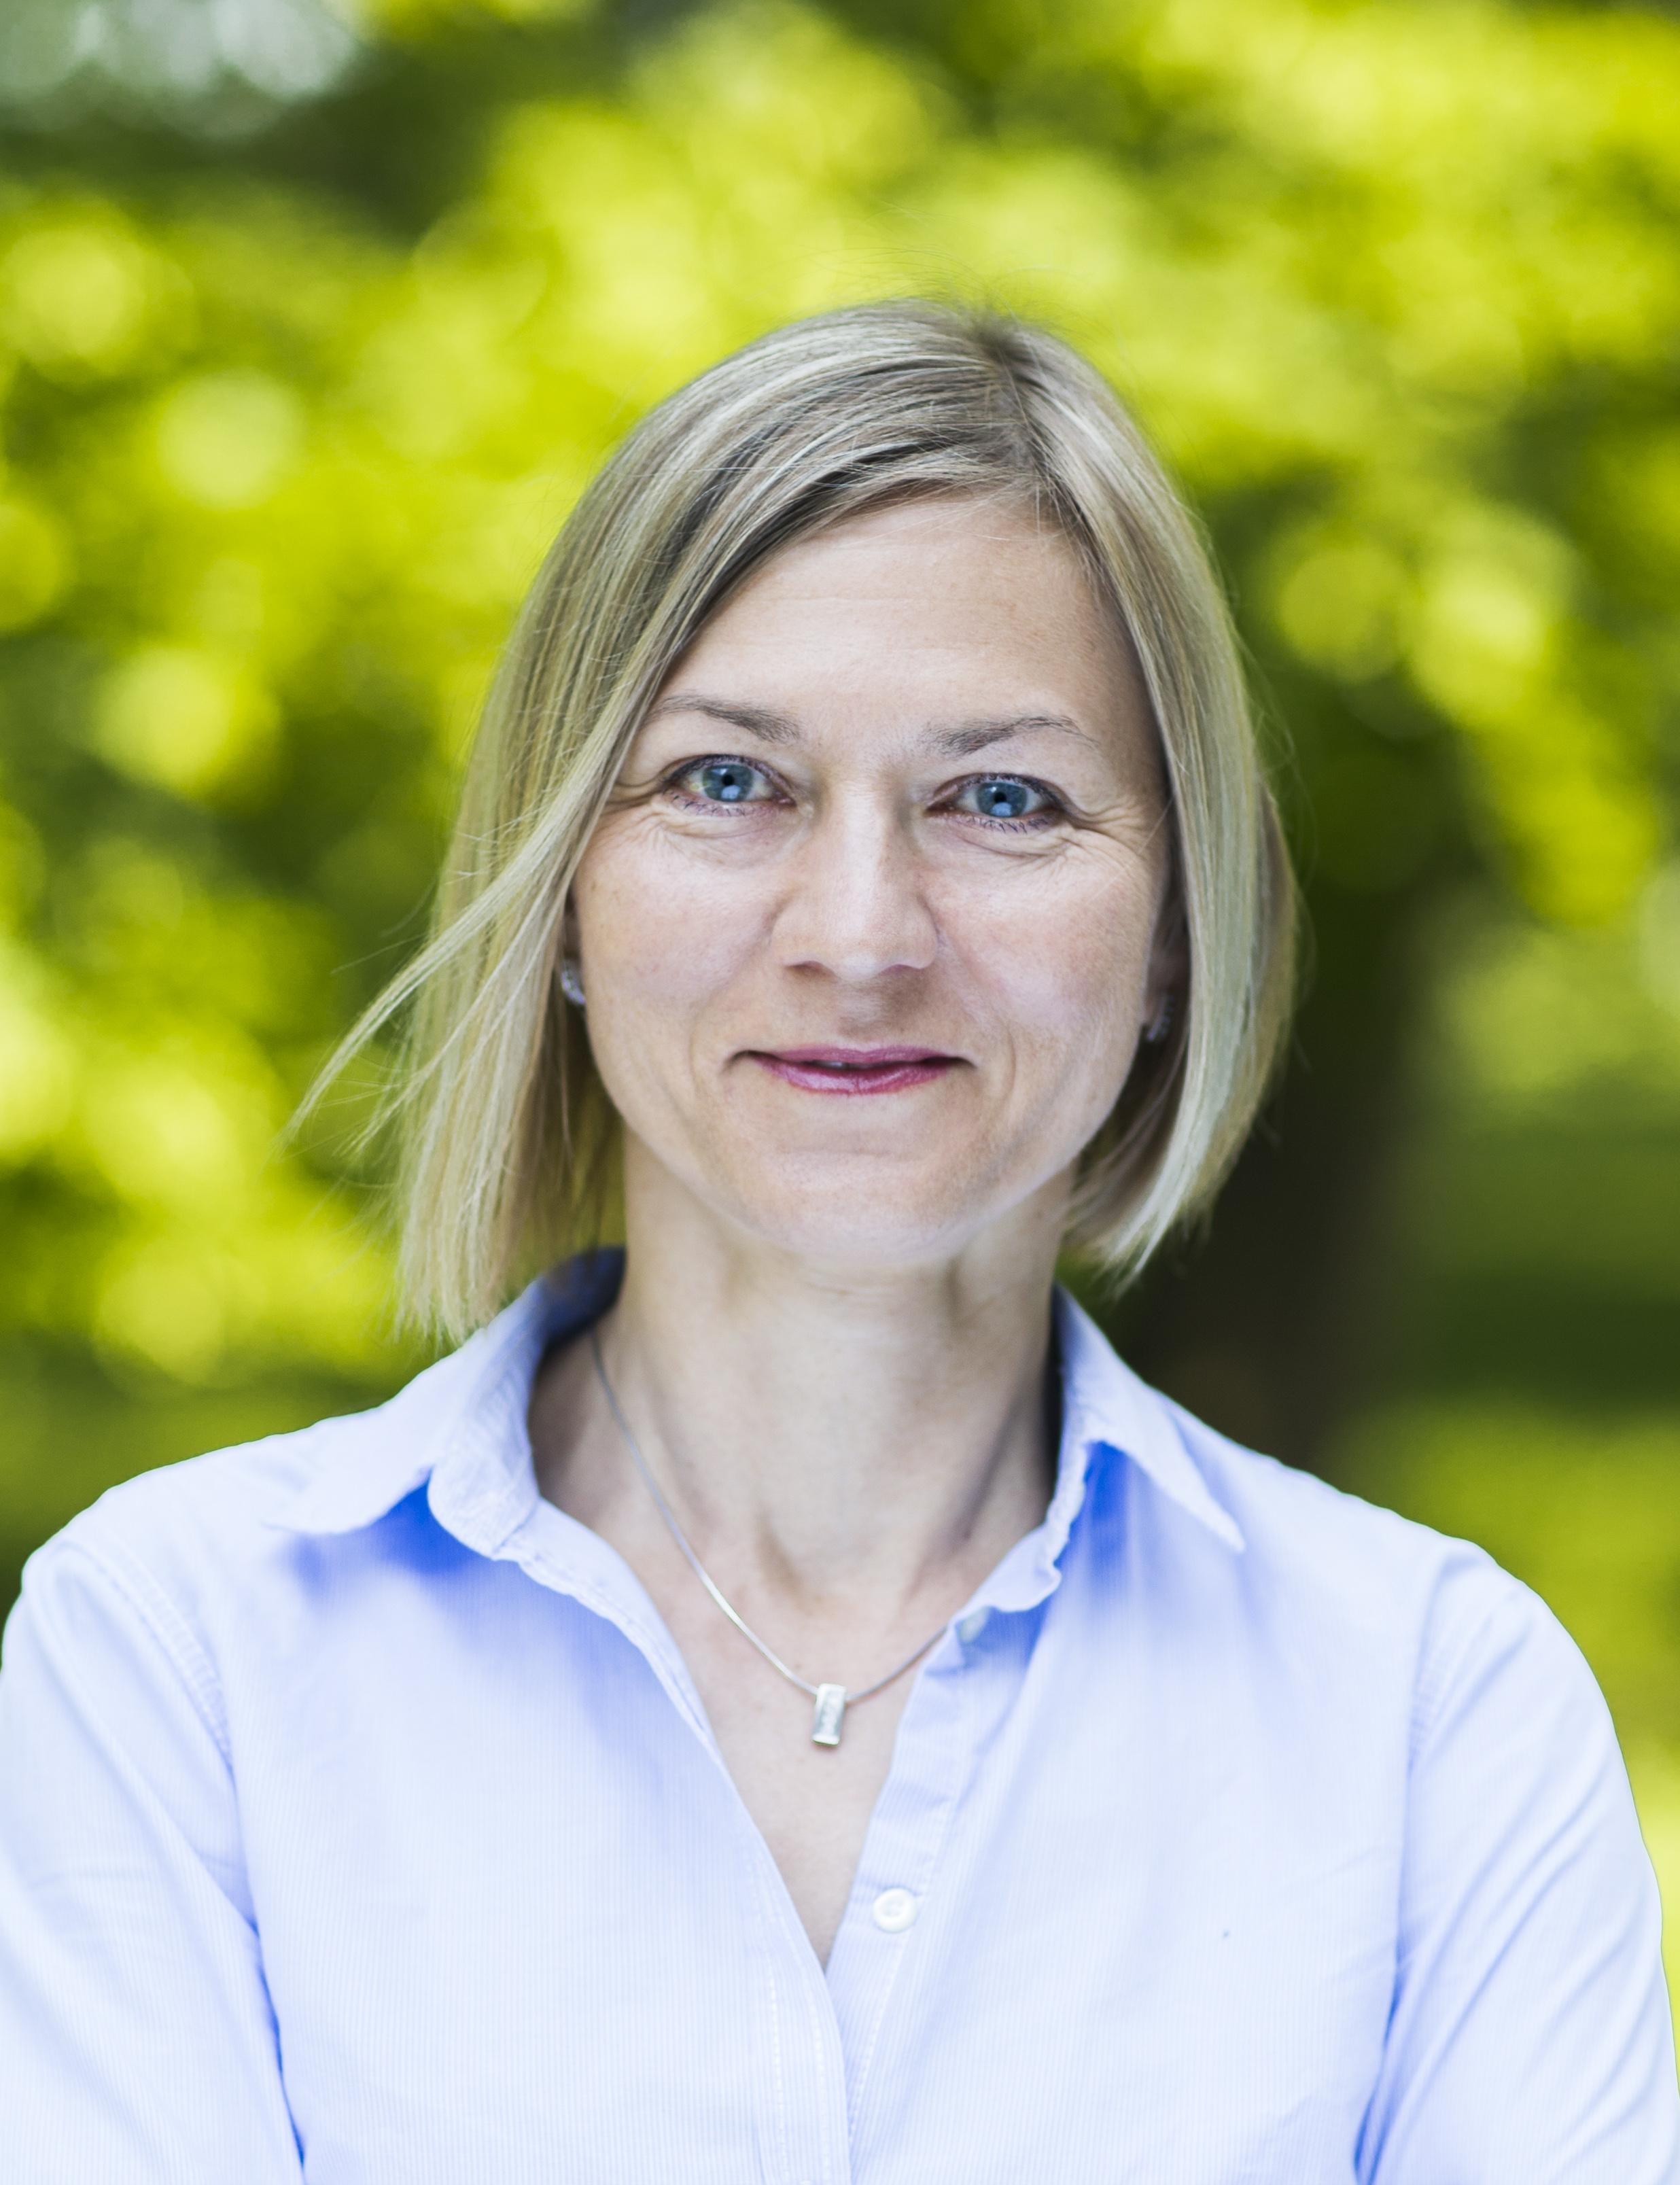 DR ALEKSANDRA NIEDZIELSKA